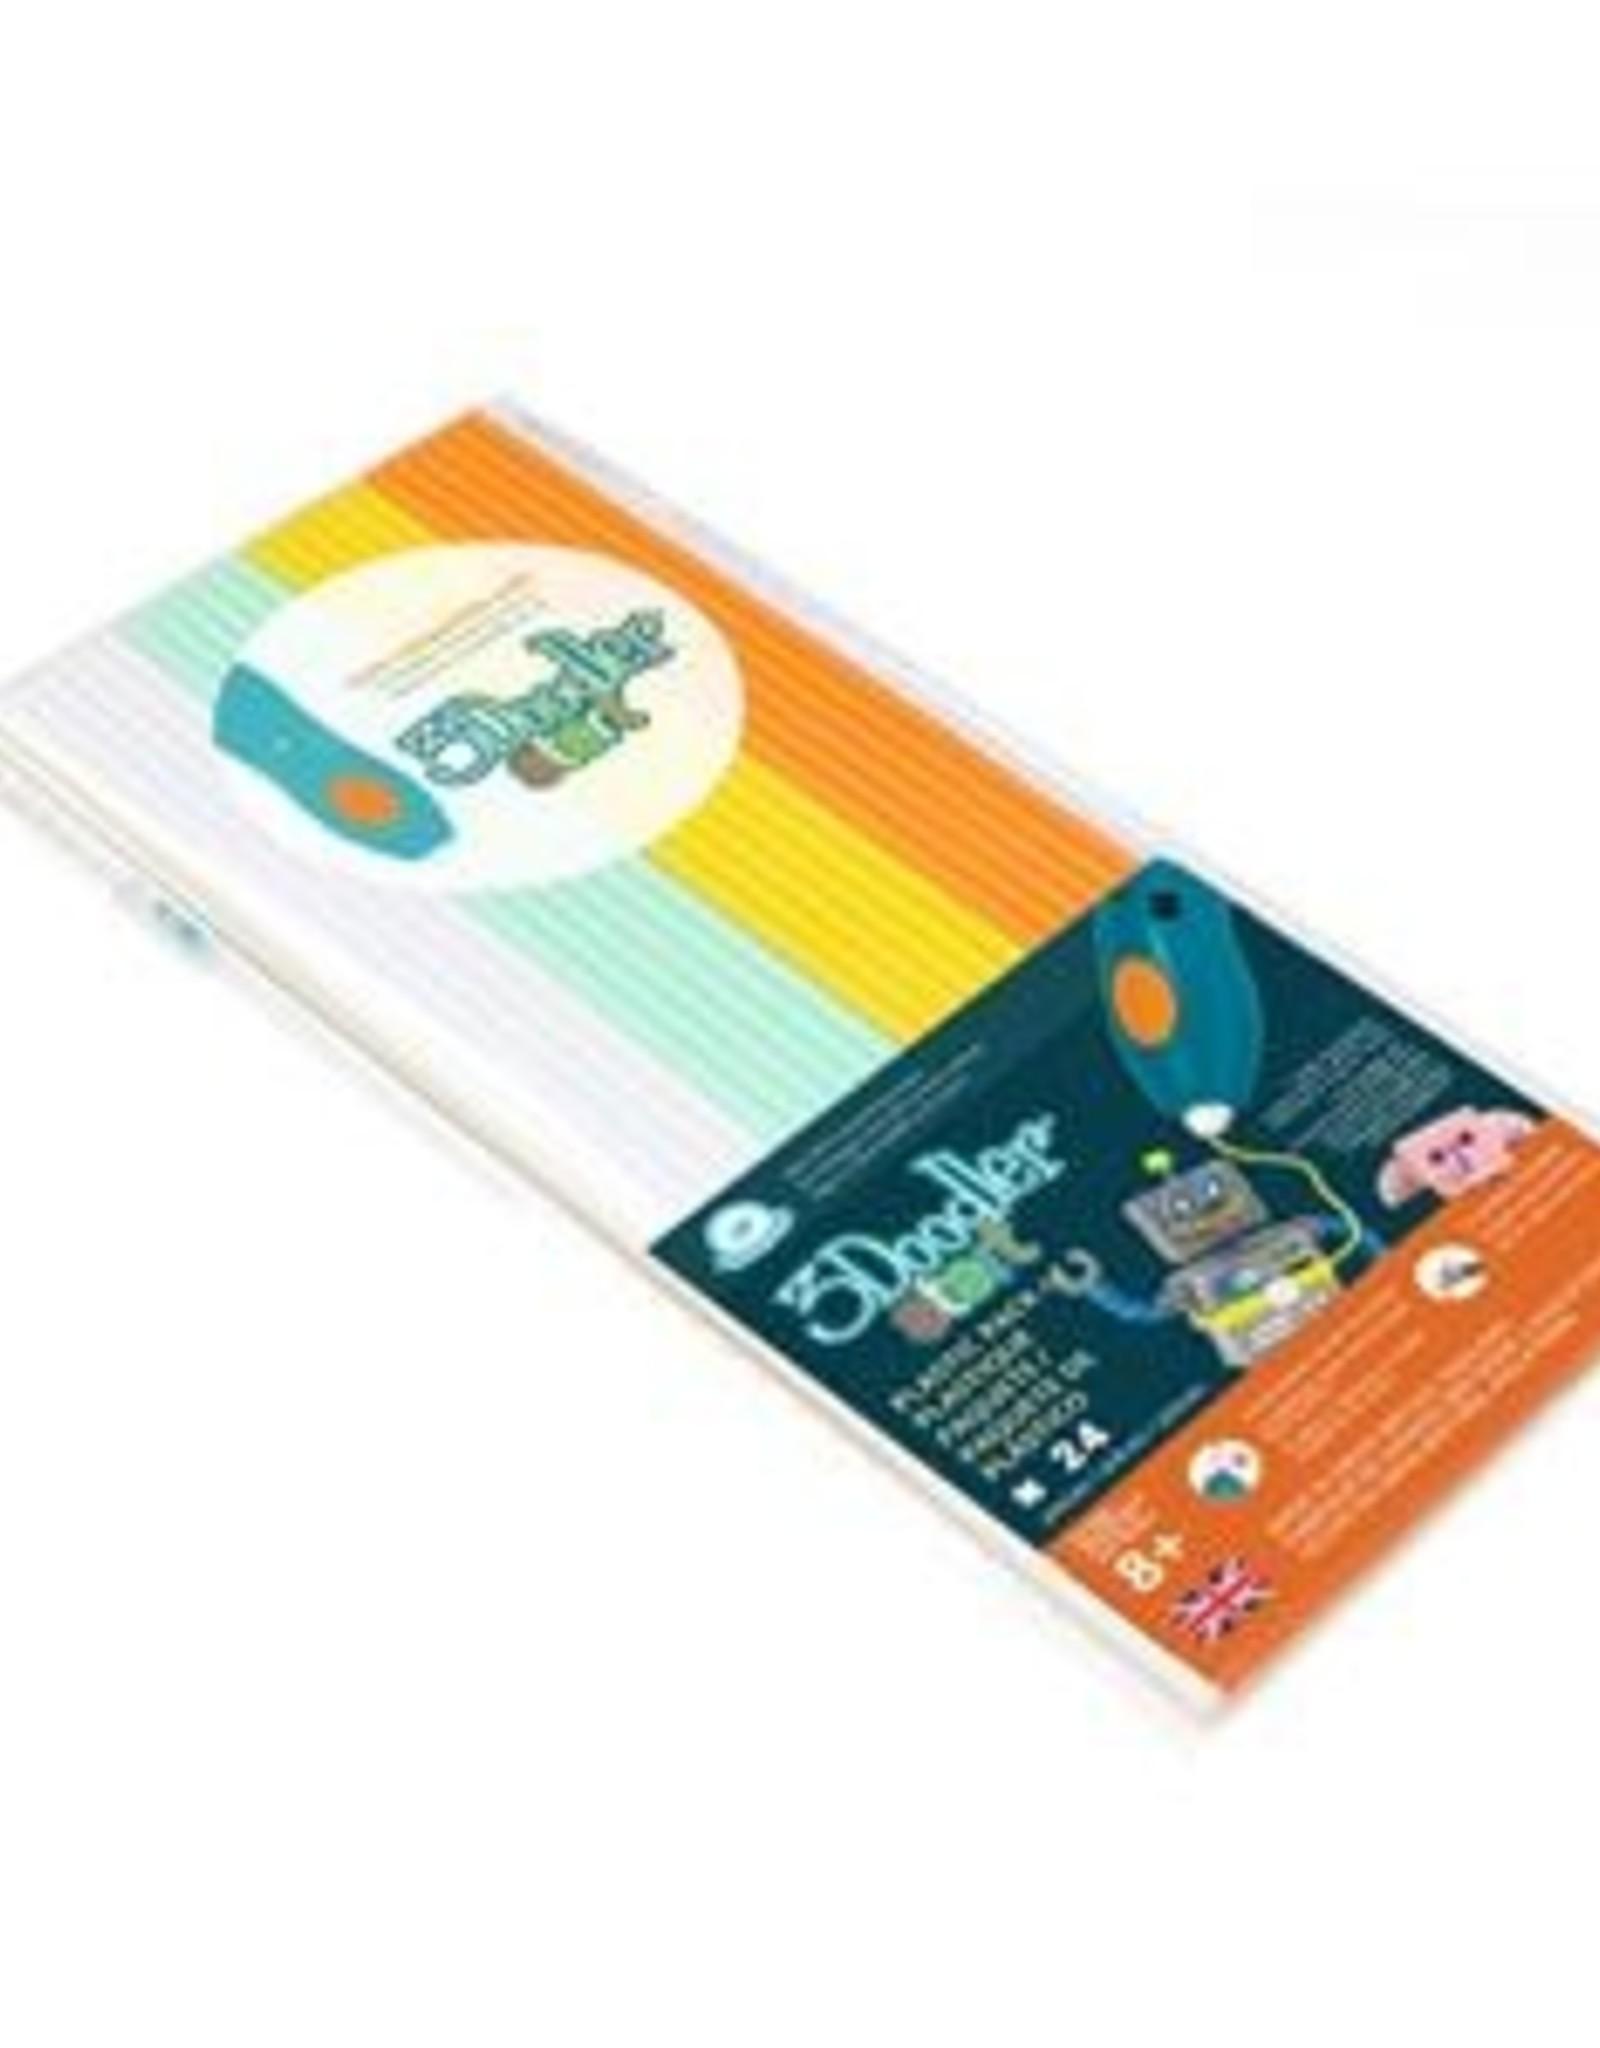 3Doodler Start EcoPlastic 100pc - Fire,Ice (Wht,Aqu,Yel,Org) 3DSECOMIX124100